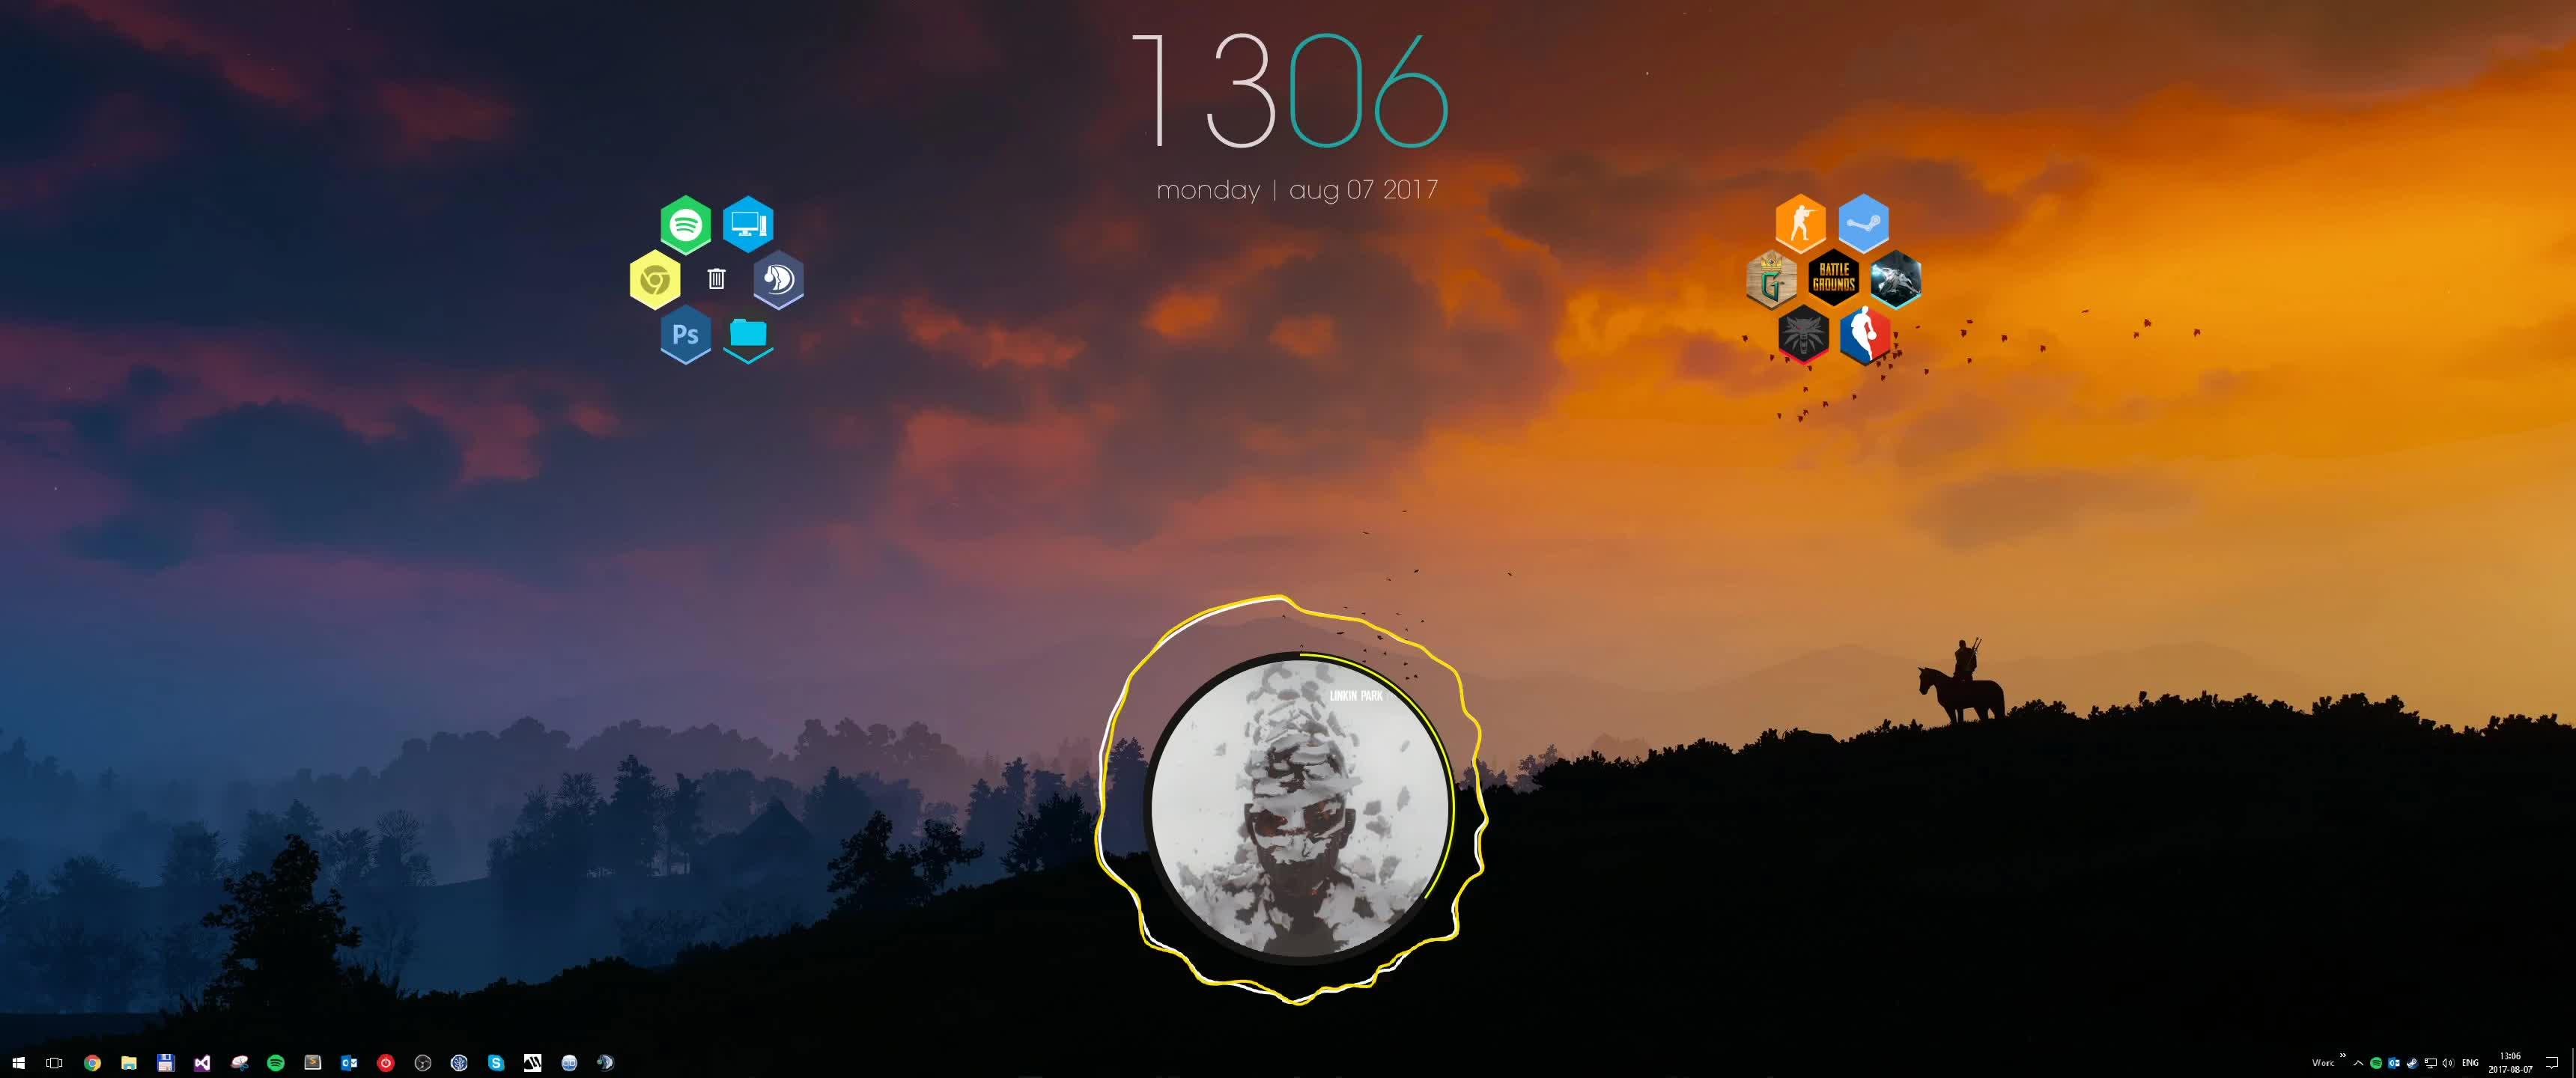 honeycomb, music, pcmasterrace, pcmr, rainmeter, ultrawide, ultrawidemasterrace, Another simple rainmeter desktop GIFs